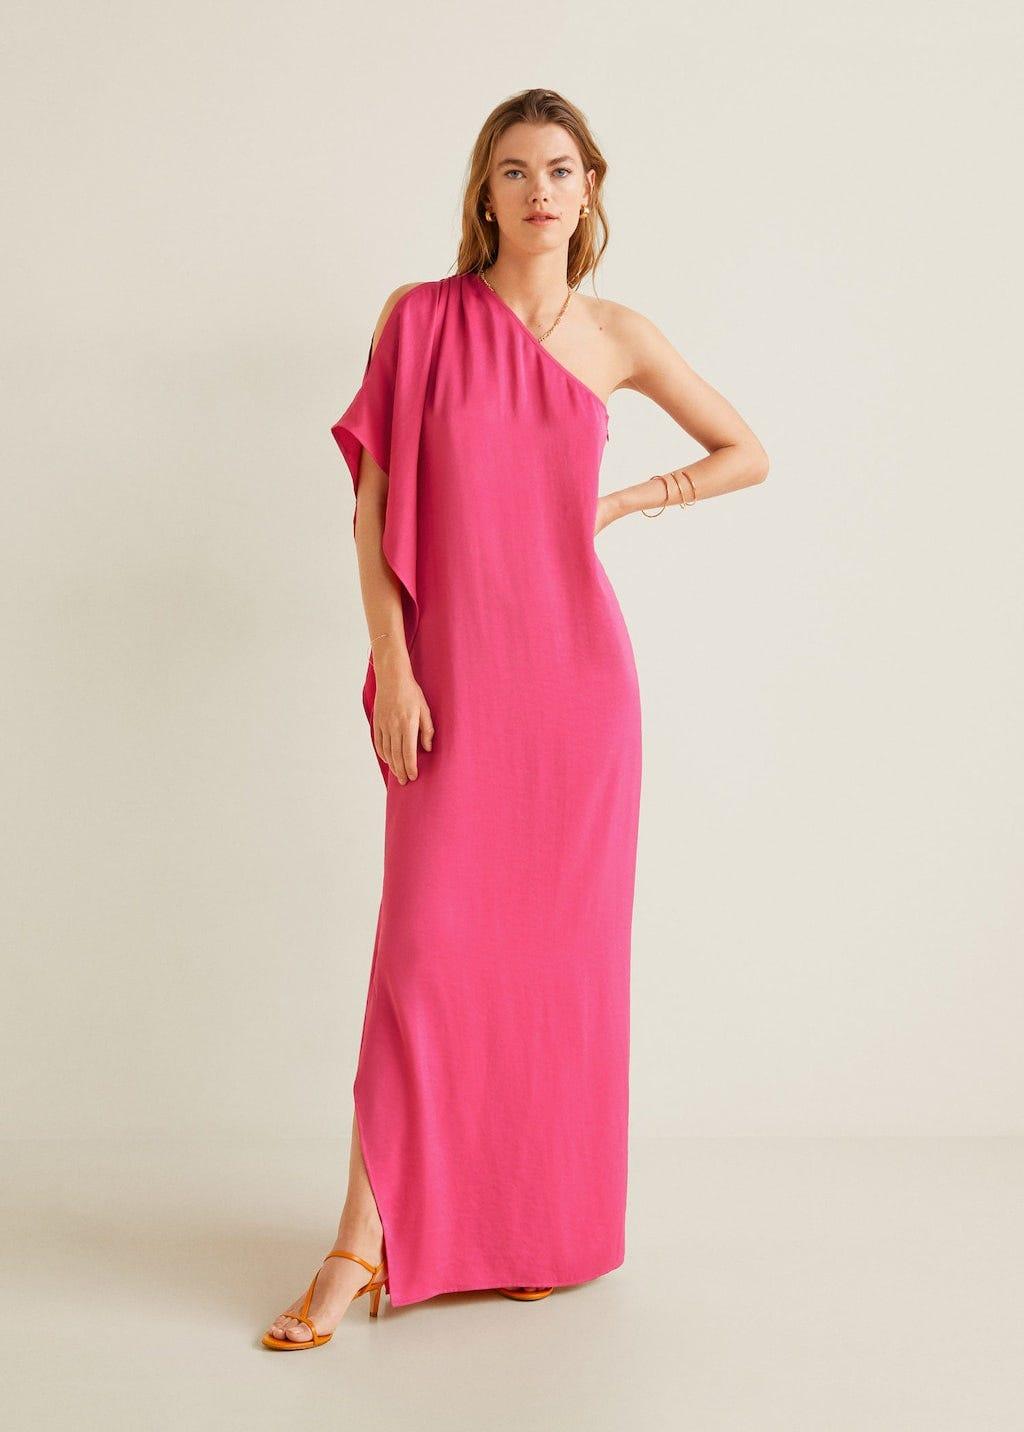 bcd50f1f75d0a Wedding Guest Dress Uk Size 18 - PostParc